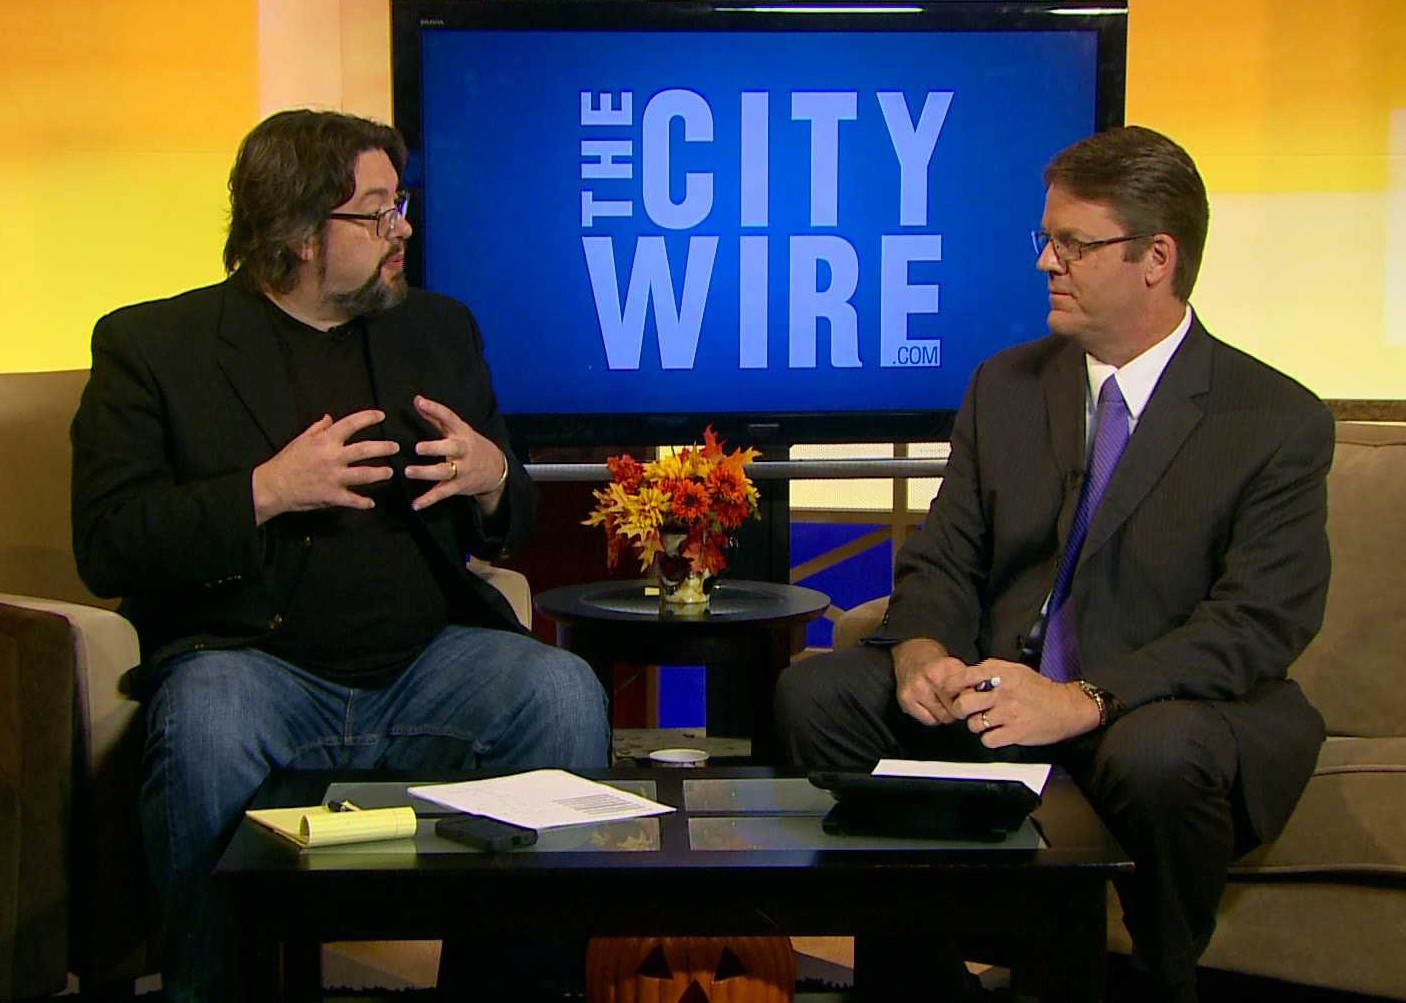 City Wire